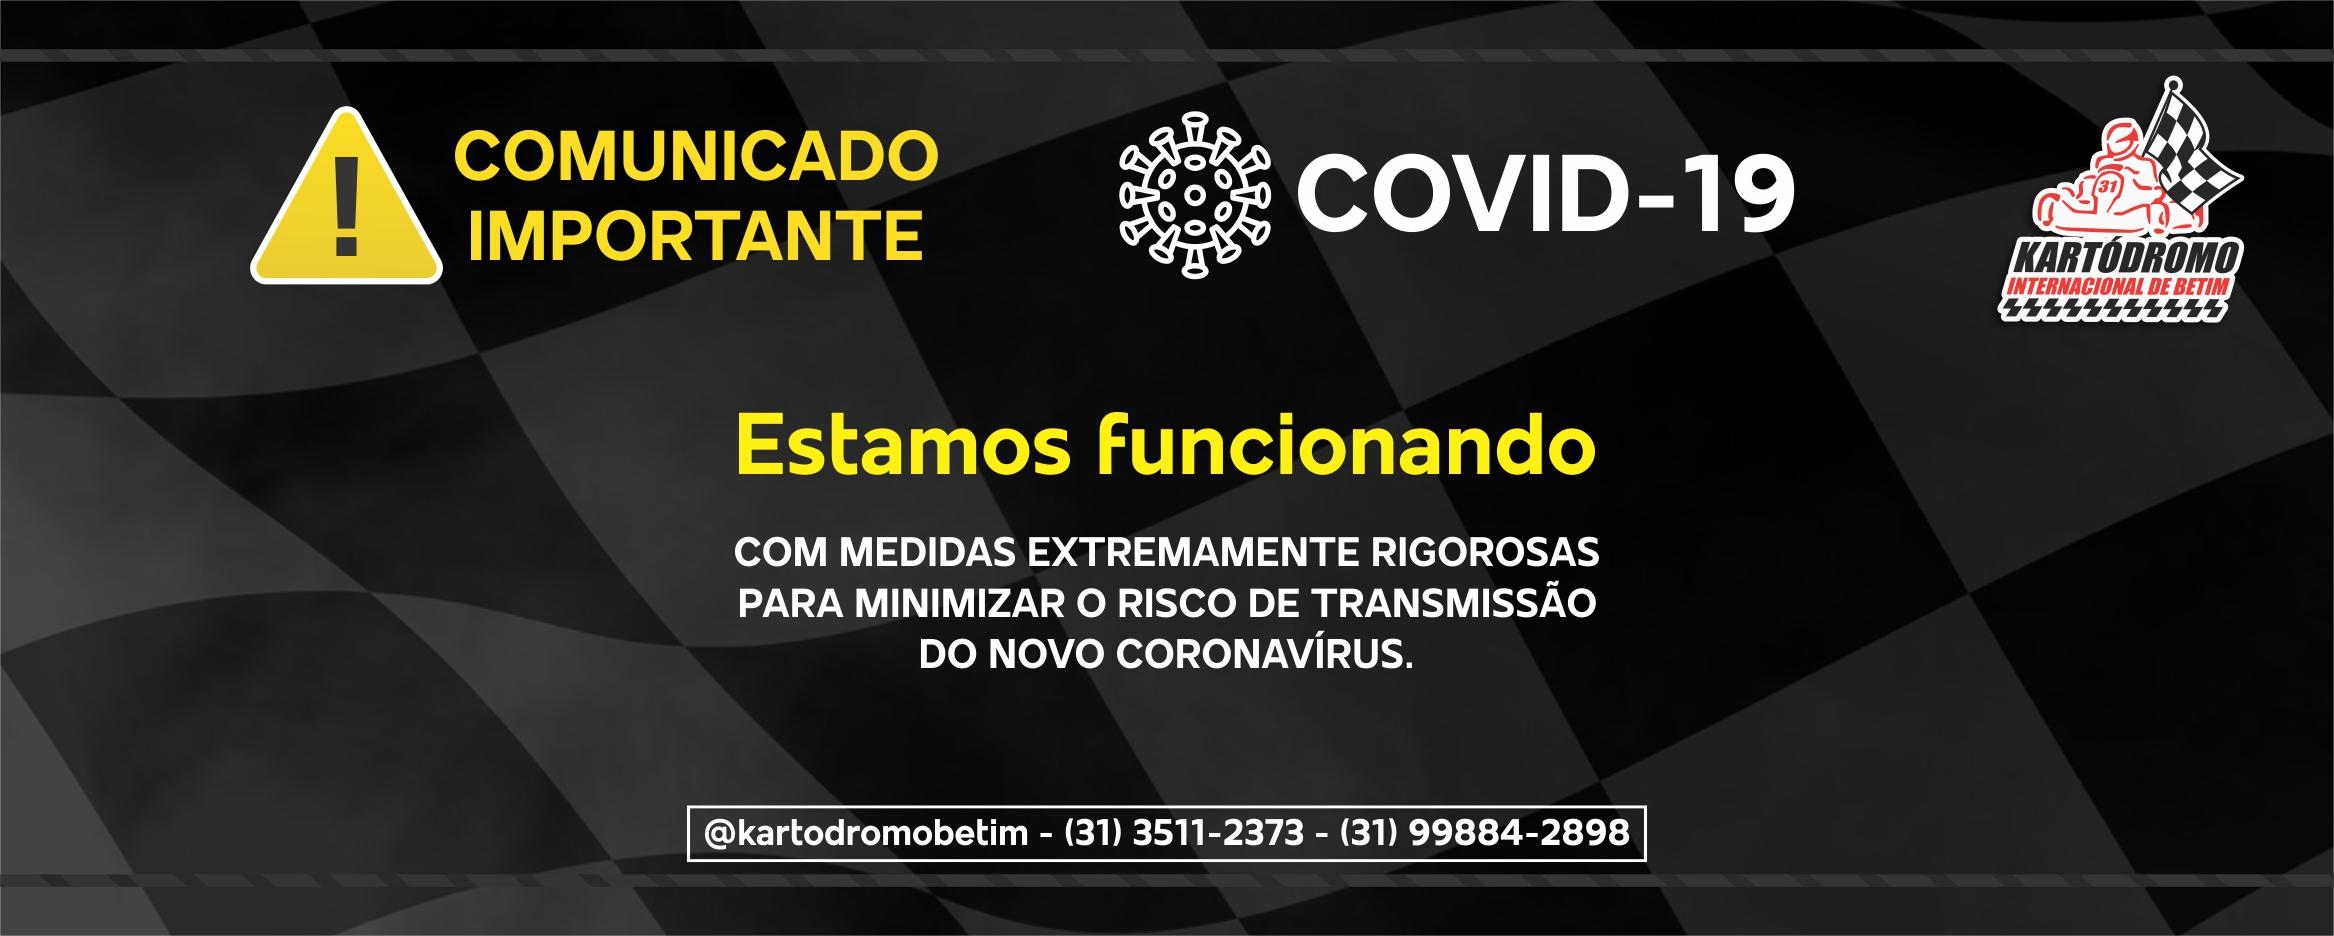 (c) Kartodromodebetim.com.br